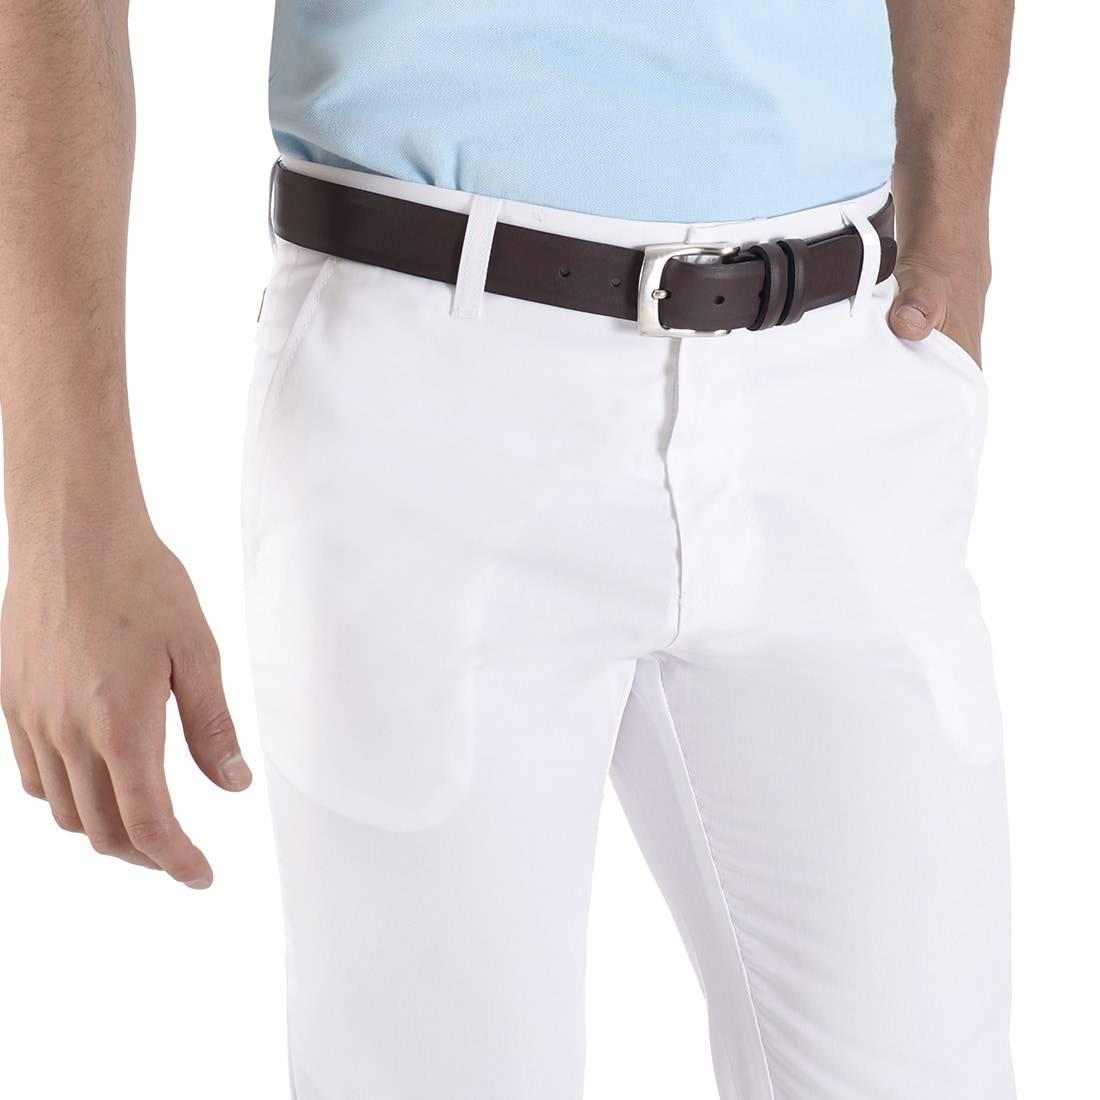 010920418902-03-Pantalon-Casual-Slim-Fit-Blanco-yale